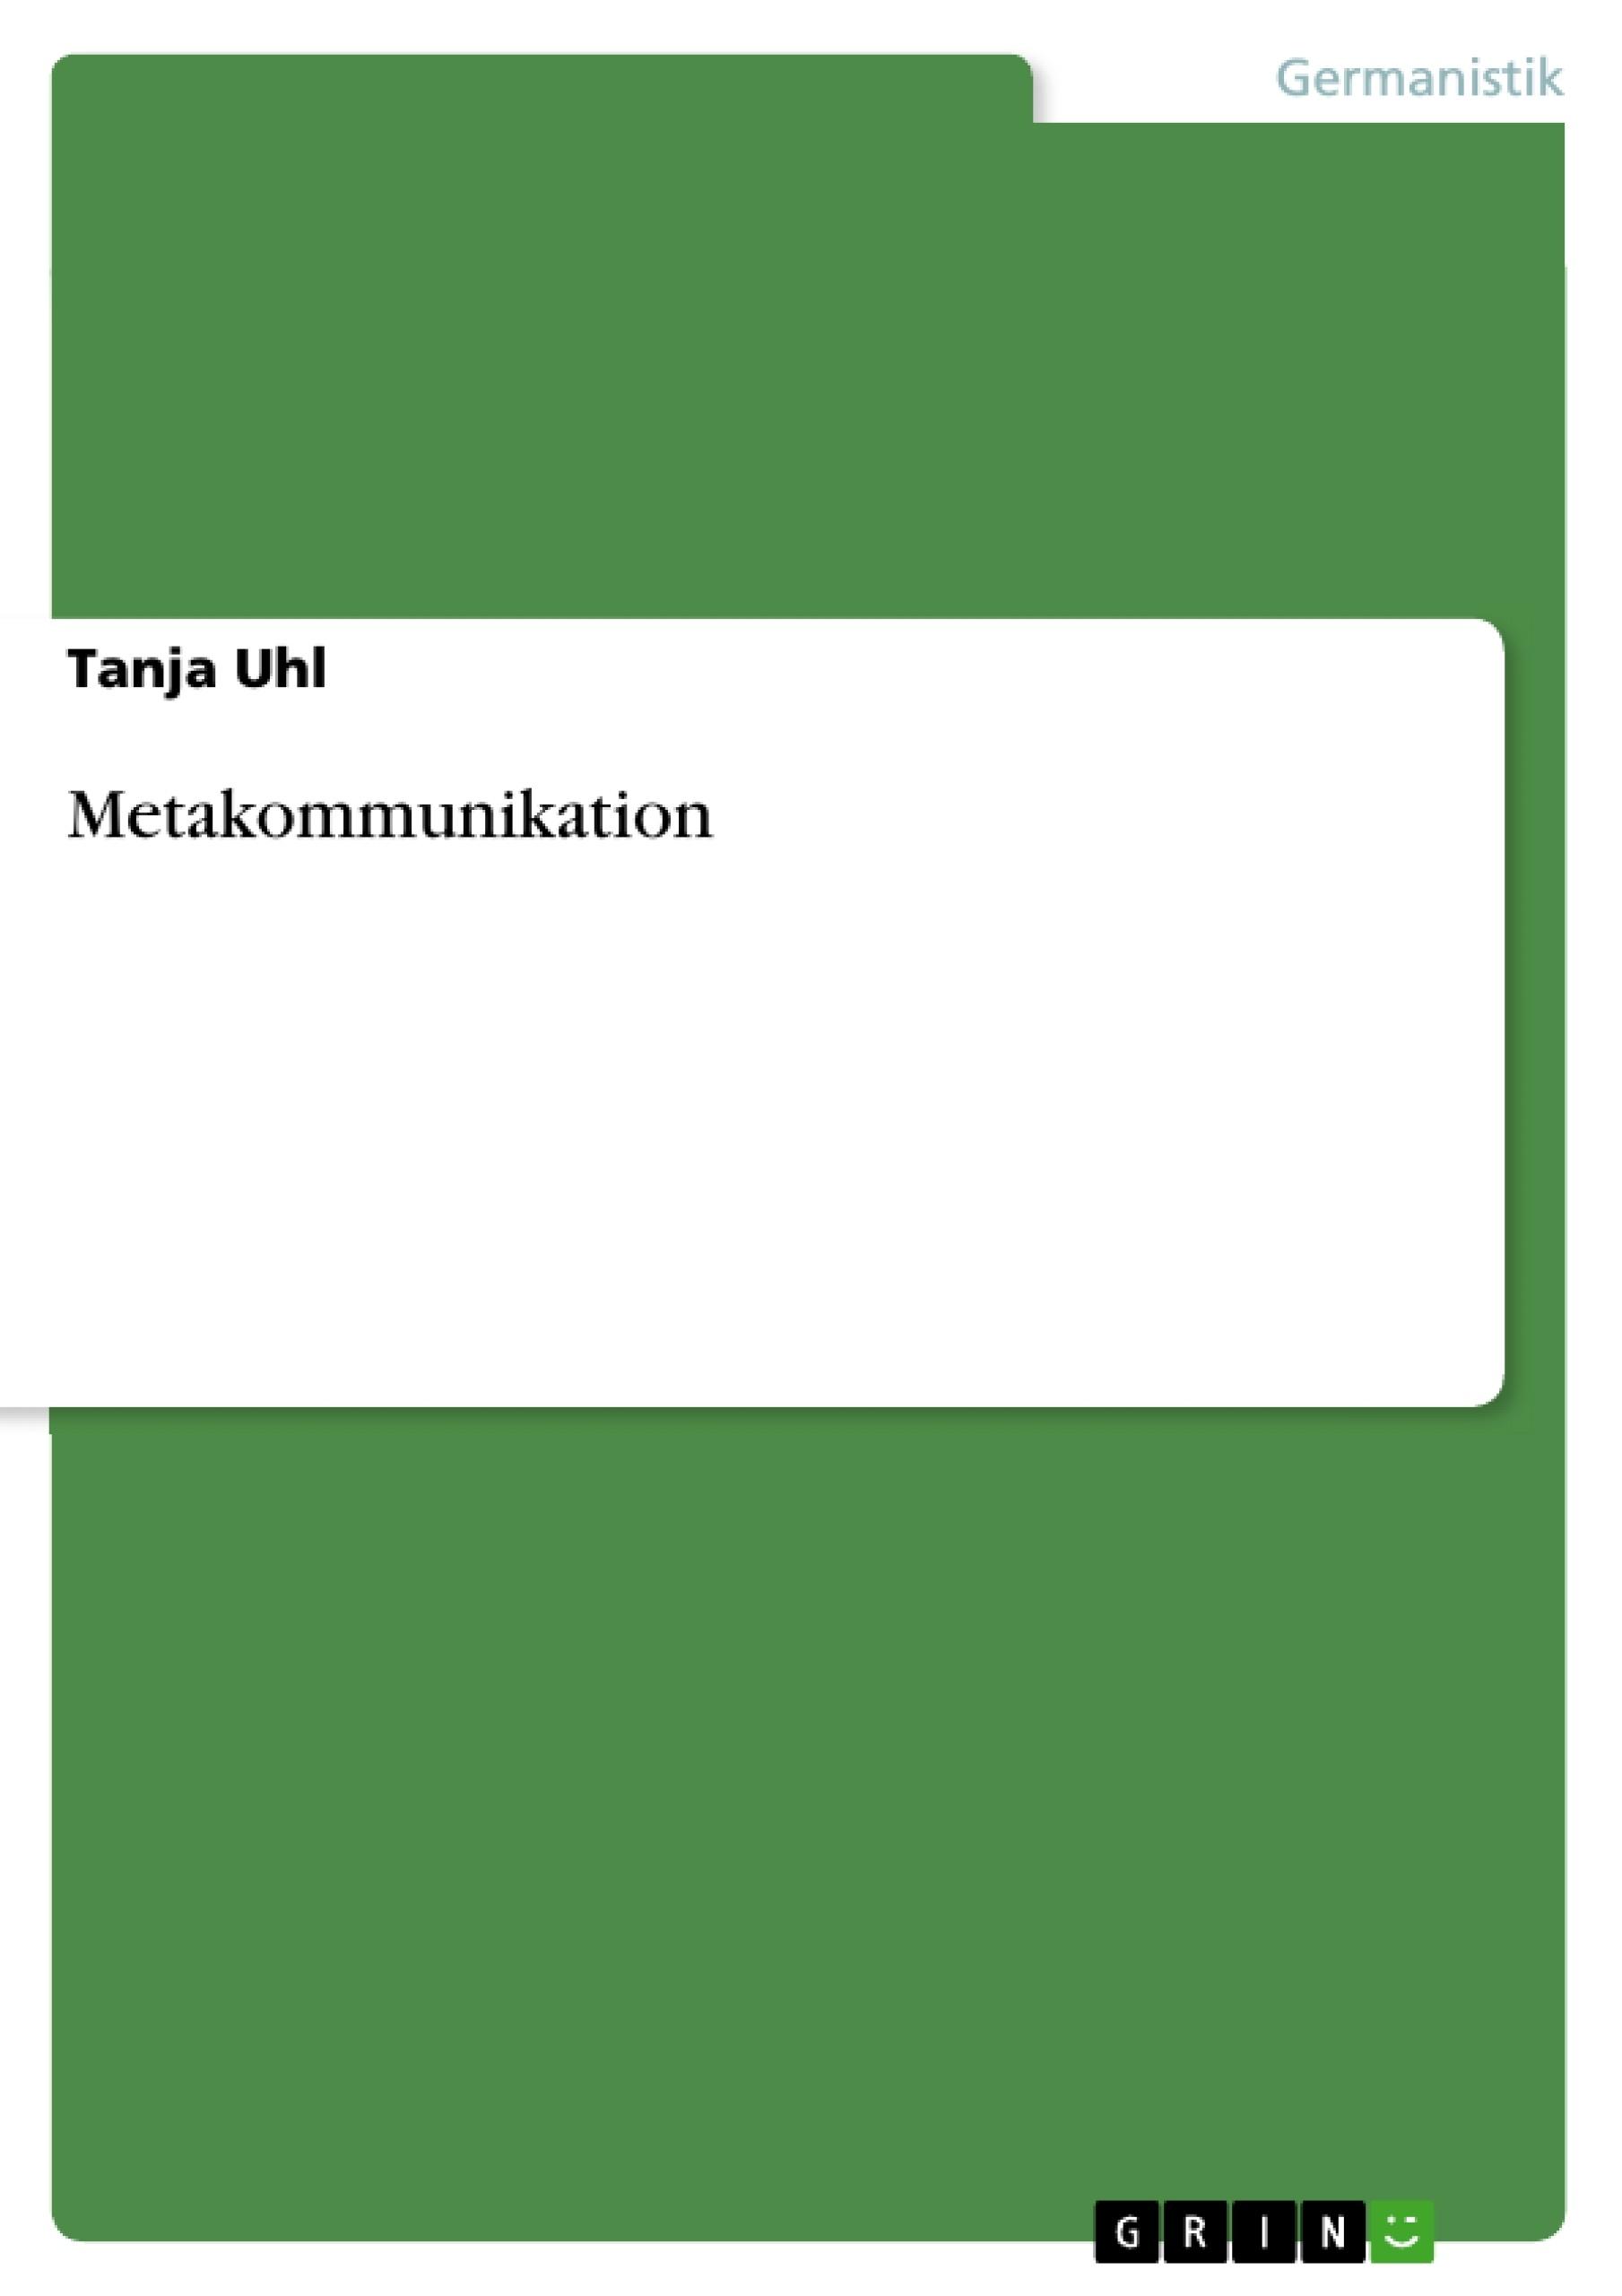 Titel: Metakommunikation